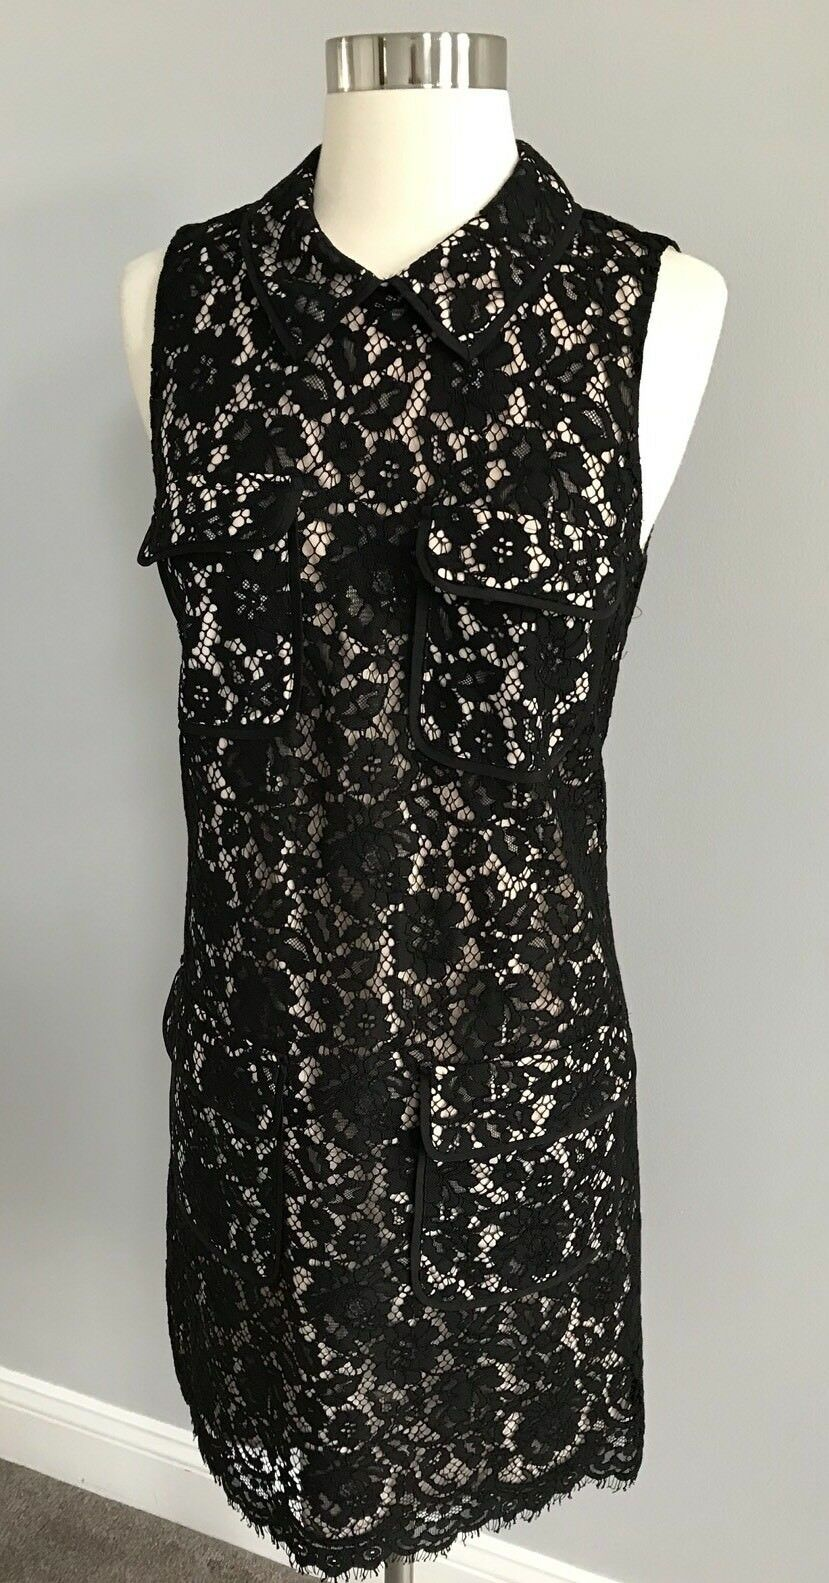 NWT J.CREW Woherren schwarz Lace Dress With 4 Pockets Größe 4